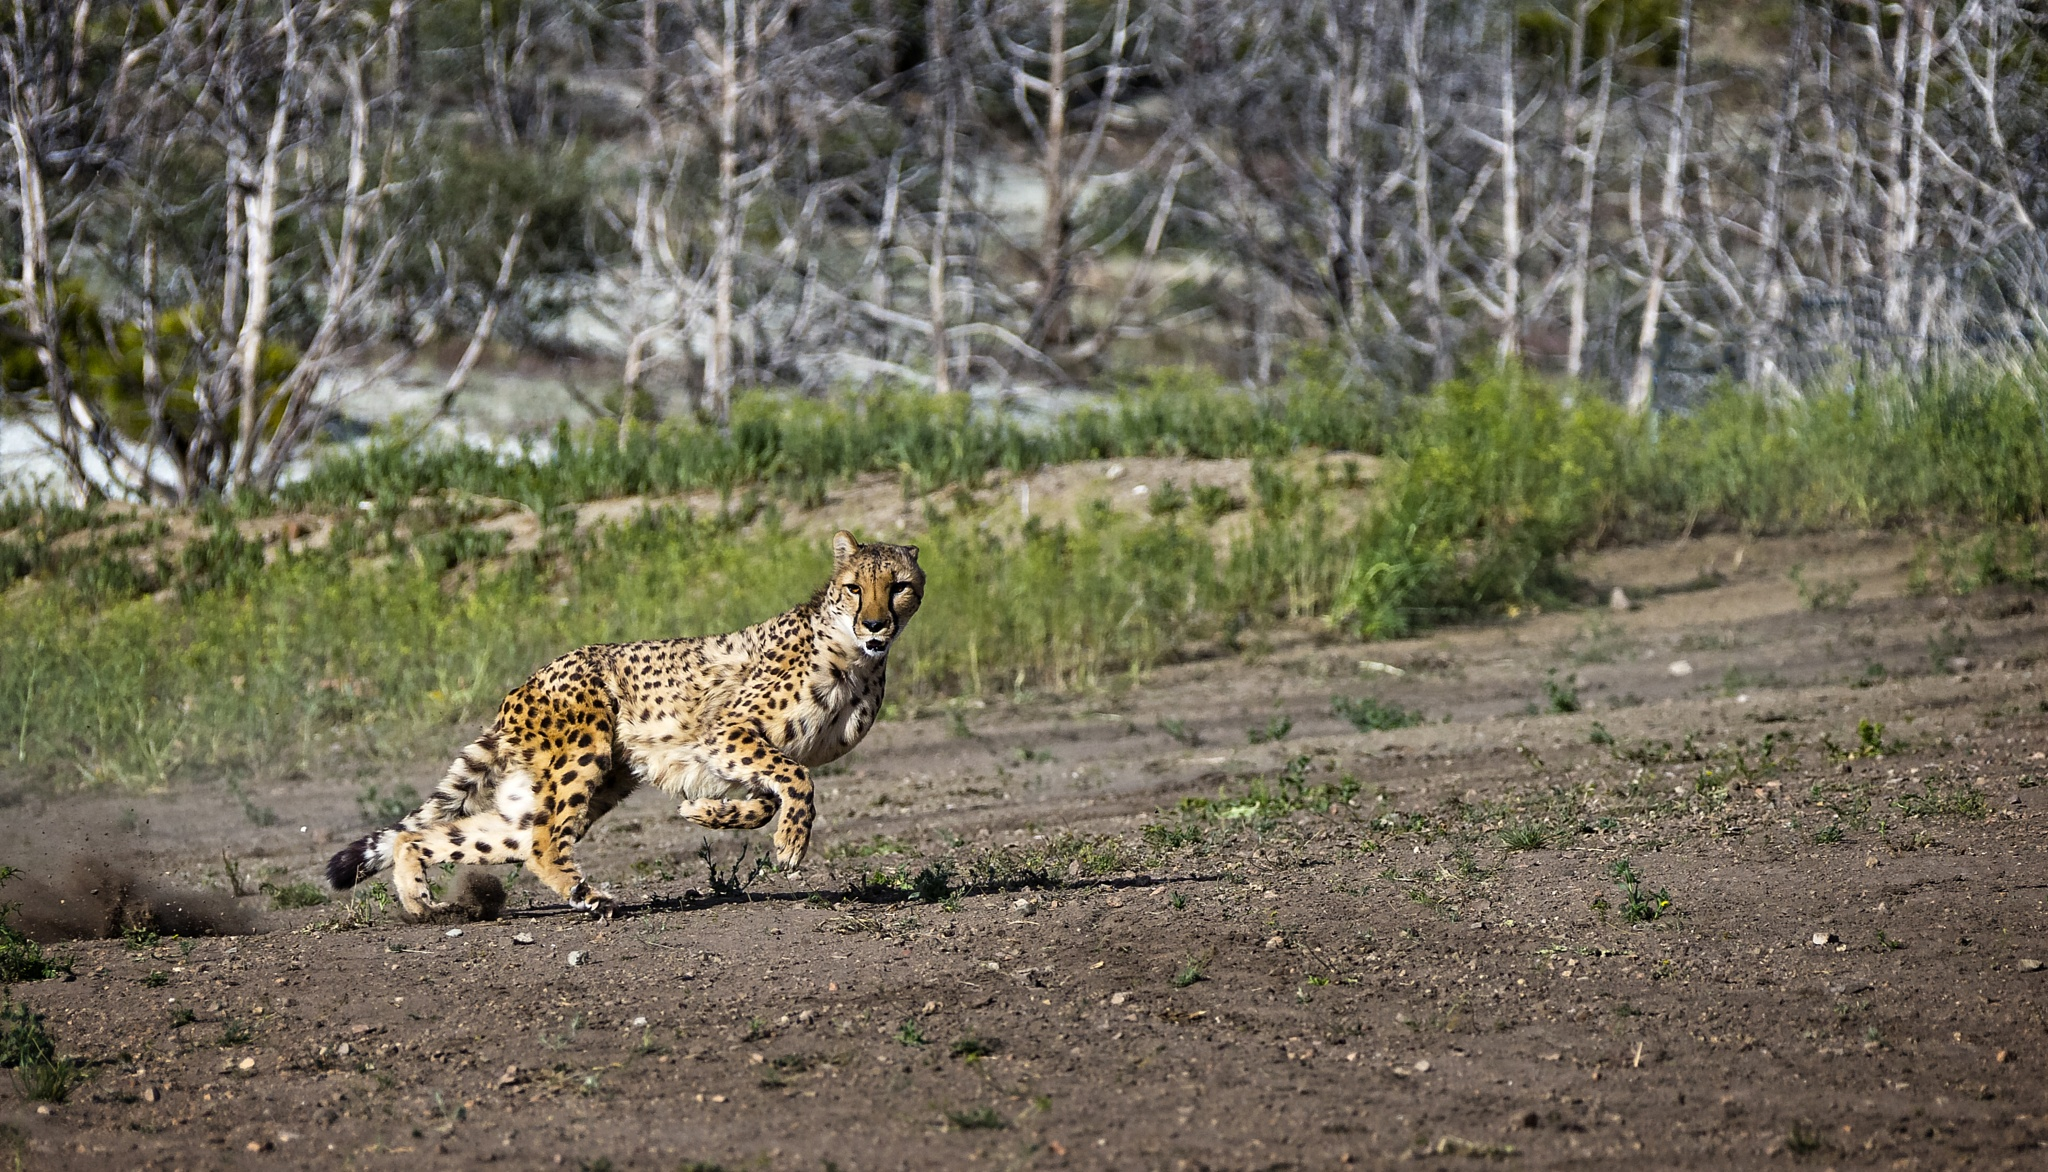 Cheetah  by Ed Stilwell